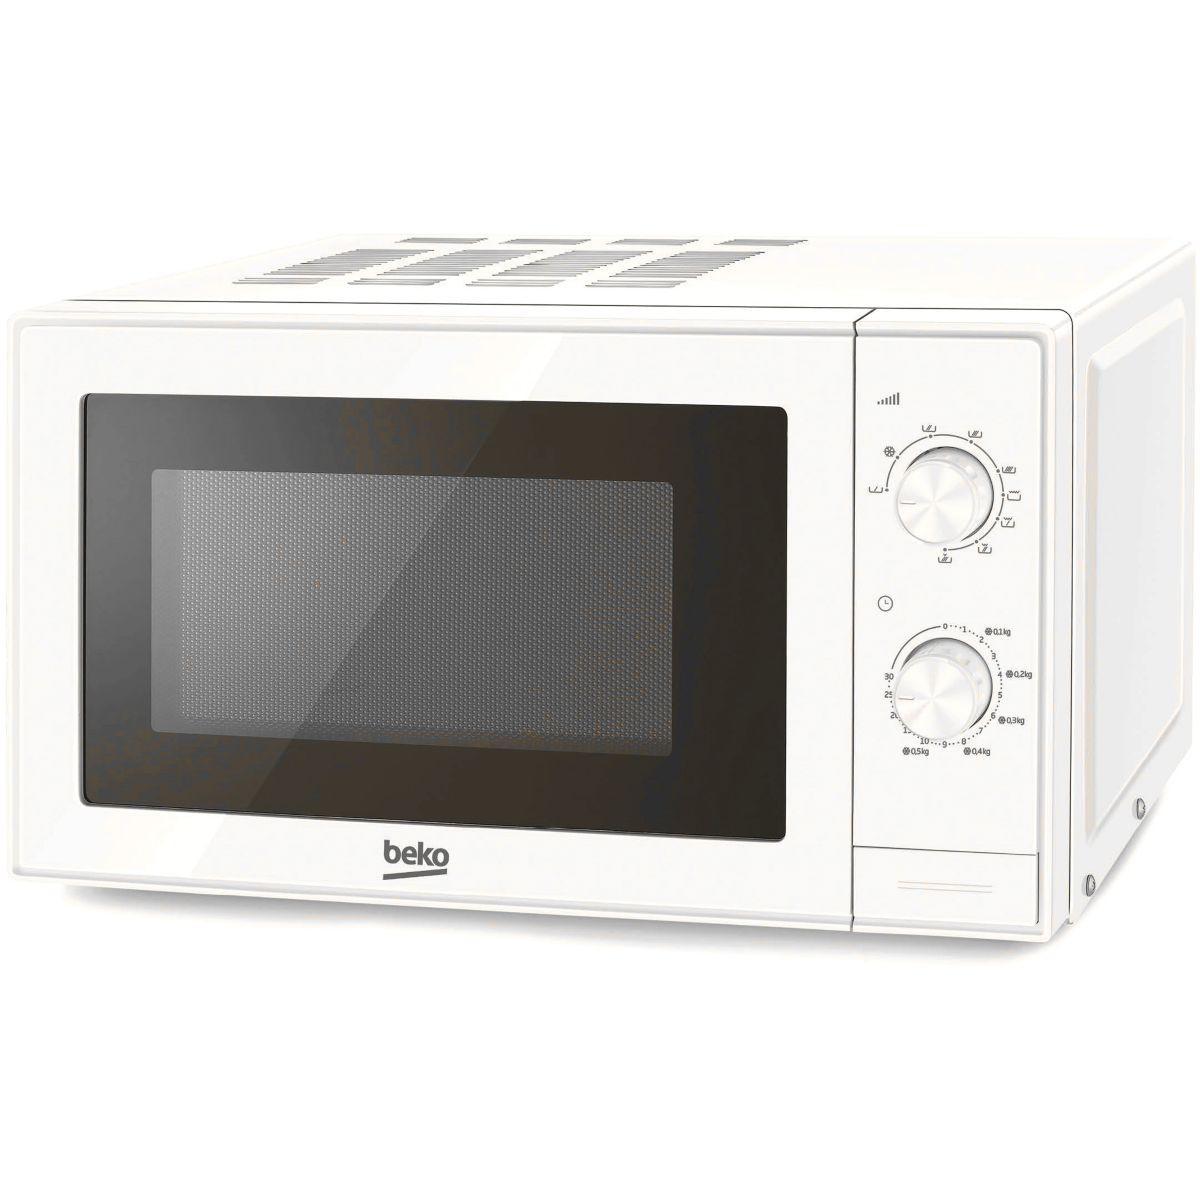 Micro-ondes grill beko mgc20100w - 2% de remise : code gam2